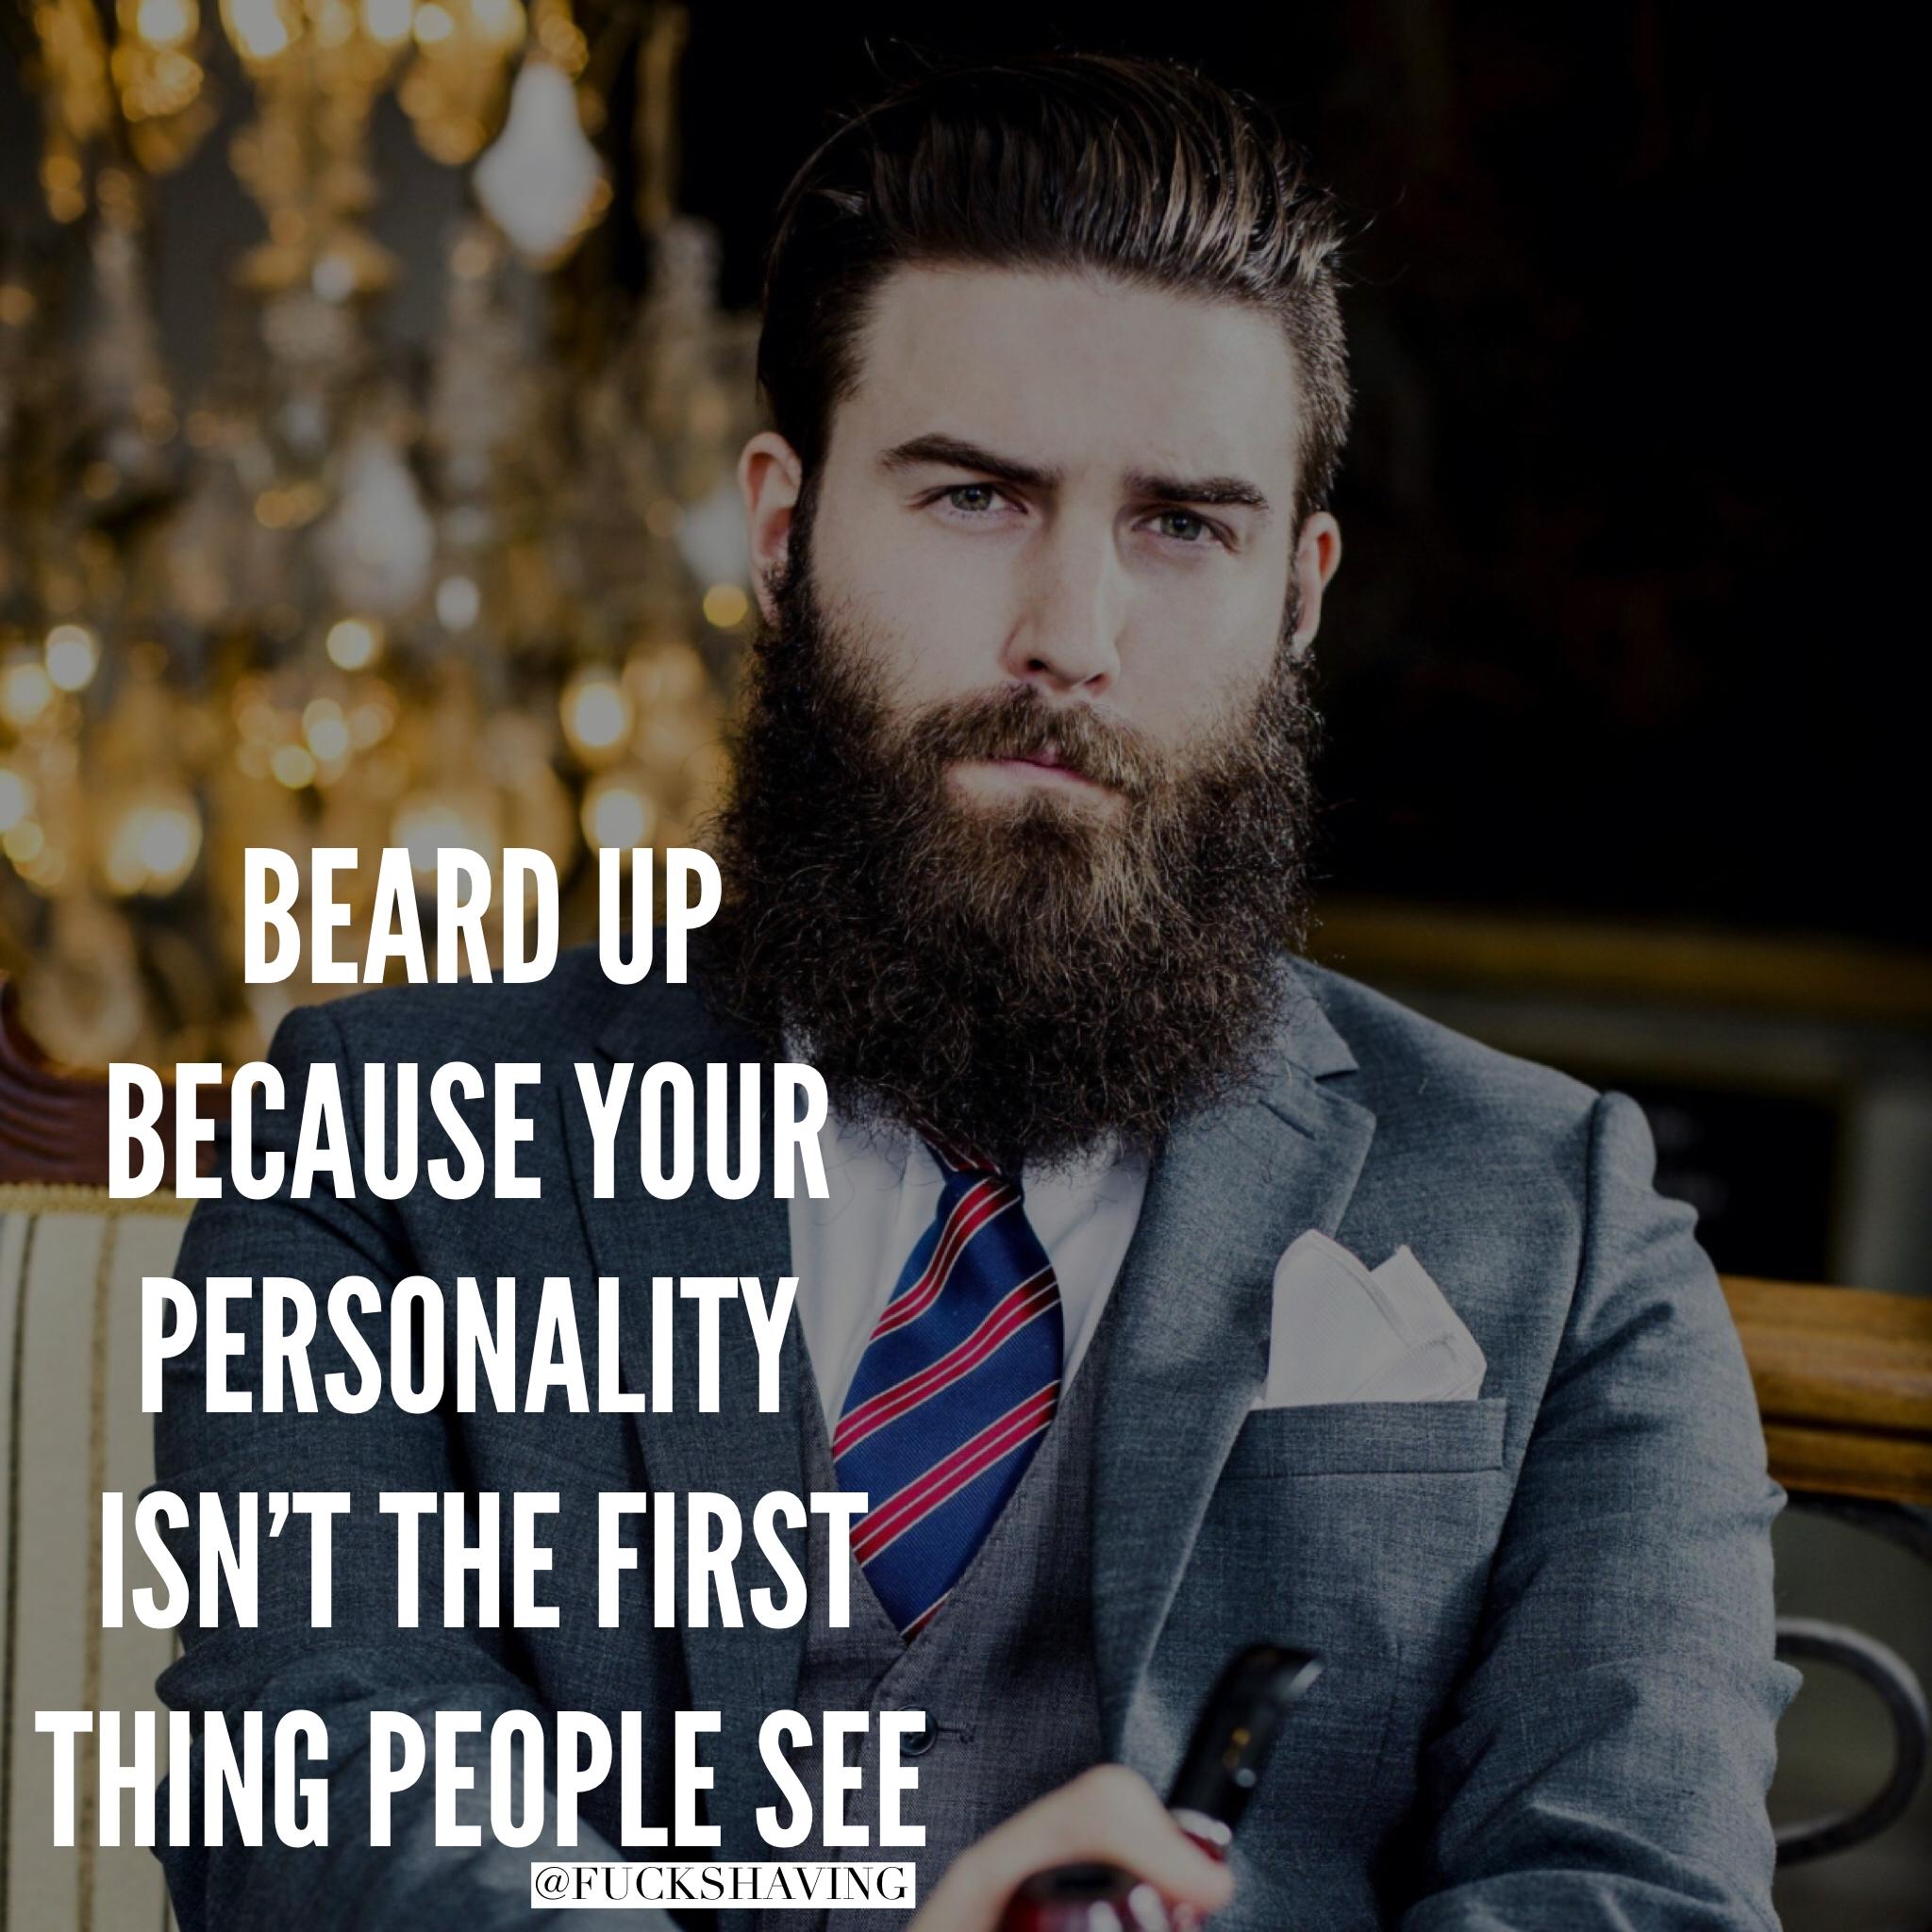 Pin by Beard And Biceps Beard Care, on Beard Funny Humor